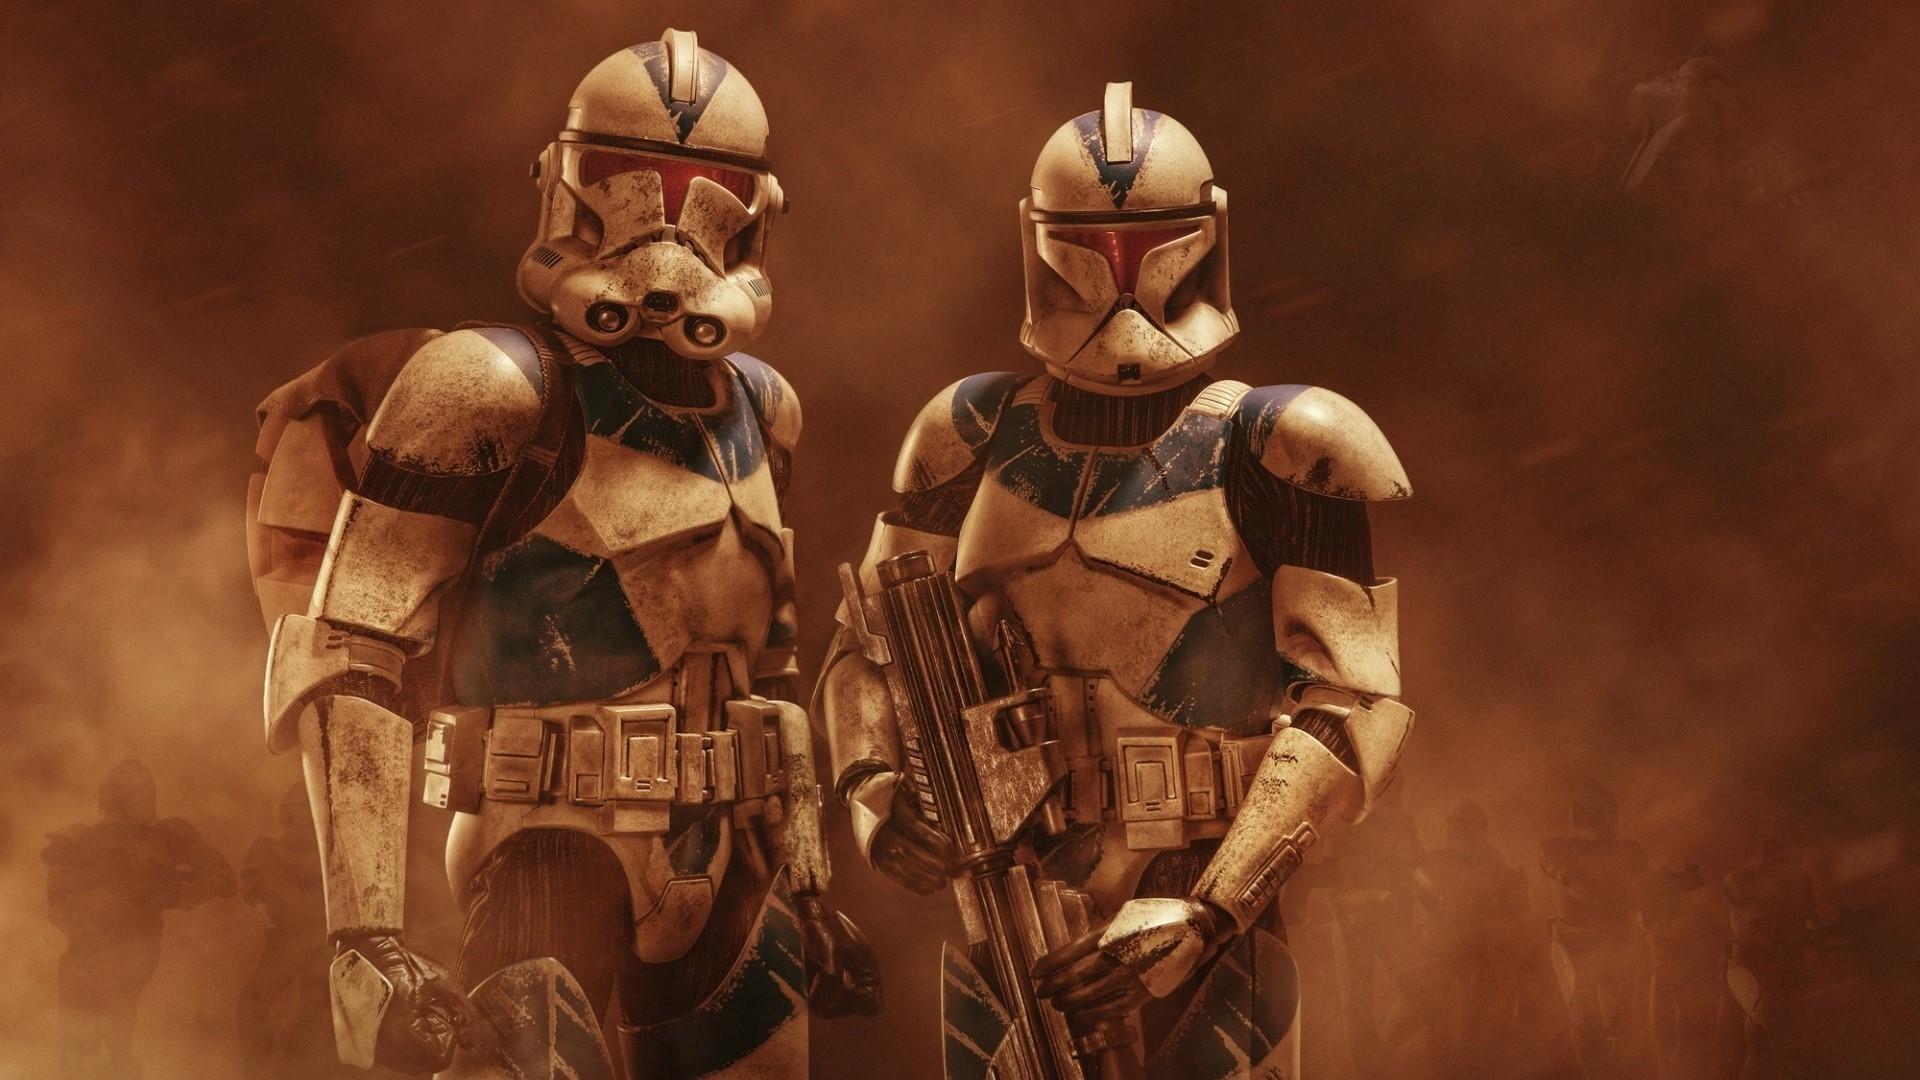 501st Clone Trooper Wallpaper 64 Images